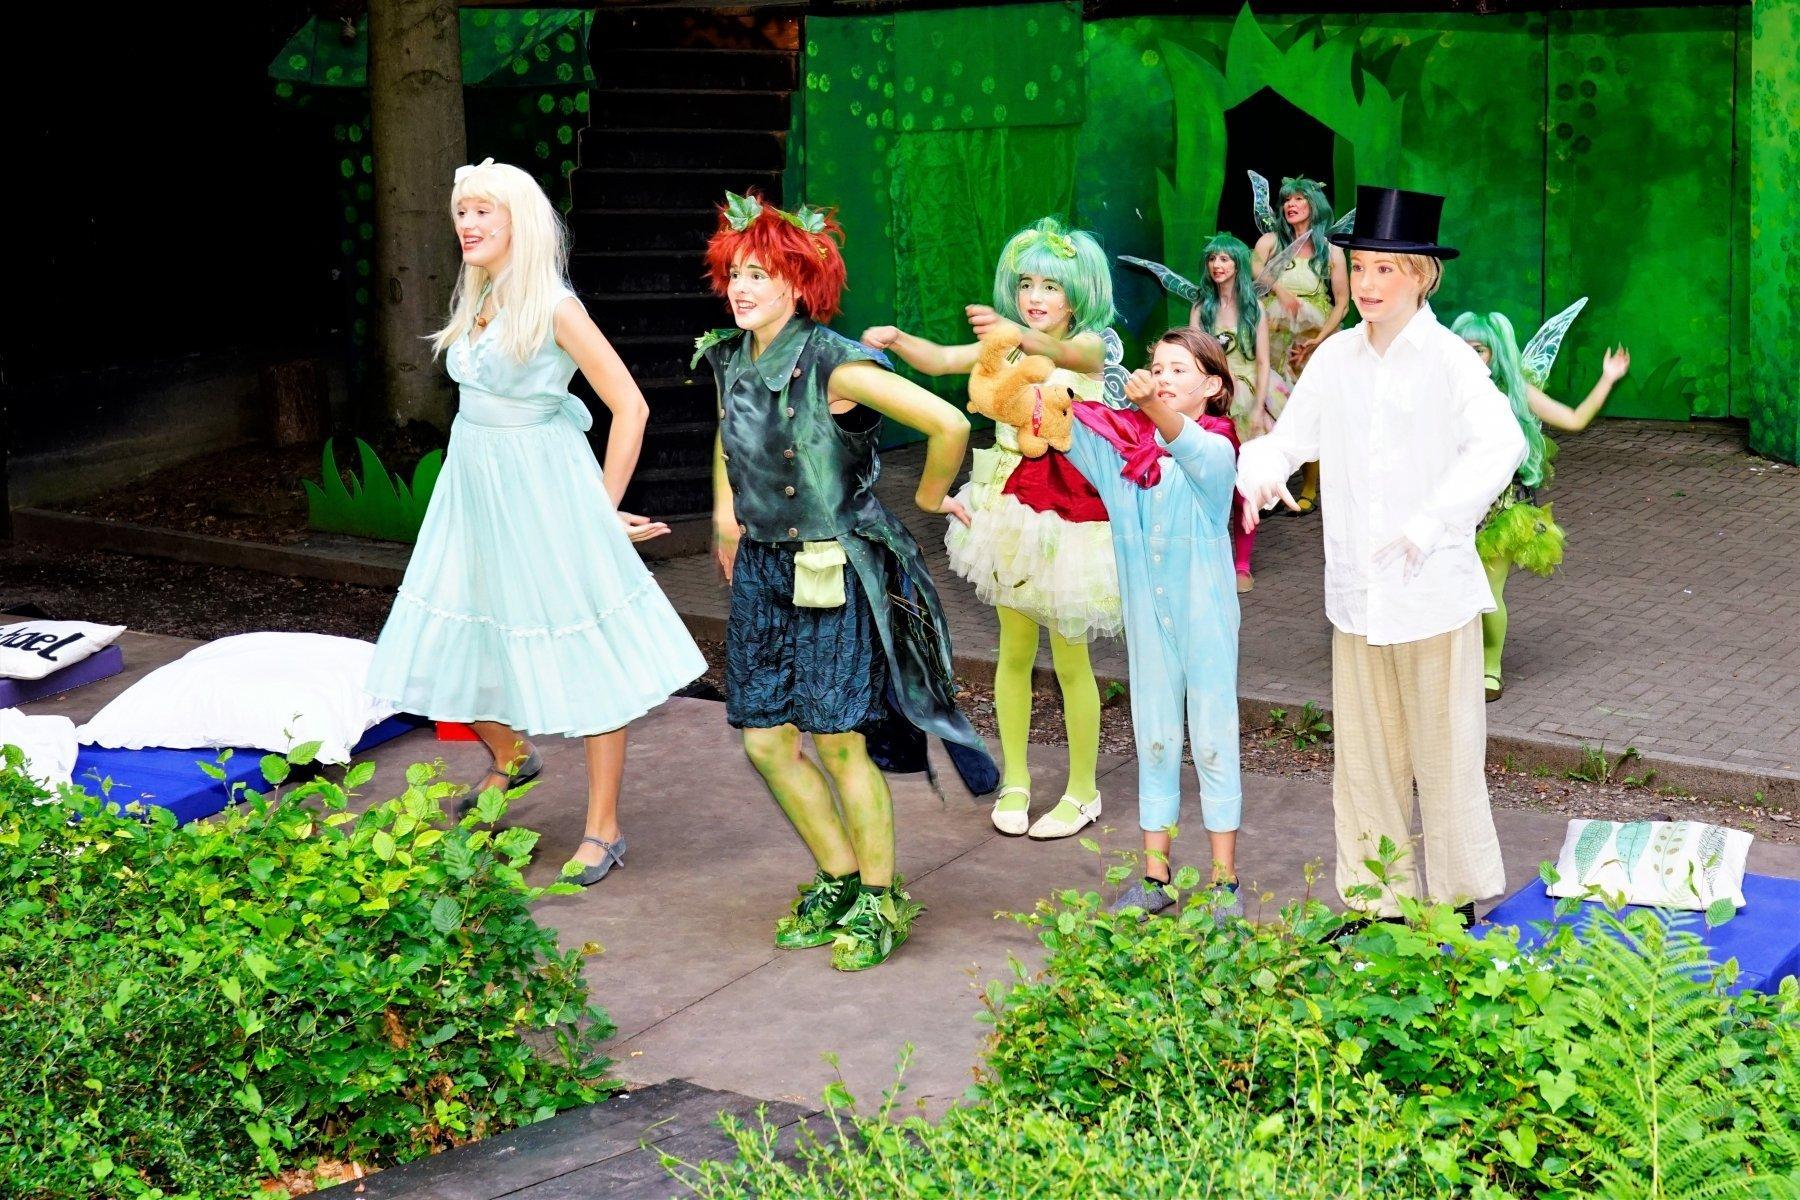 (v. l.) Wendy, Peter Pan, Tinkerbell, John und Michael (Fotos: IN-StadtMagazine)